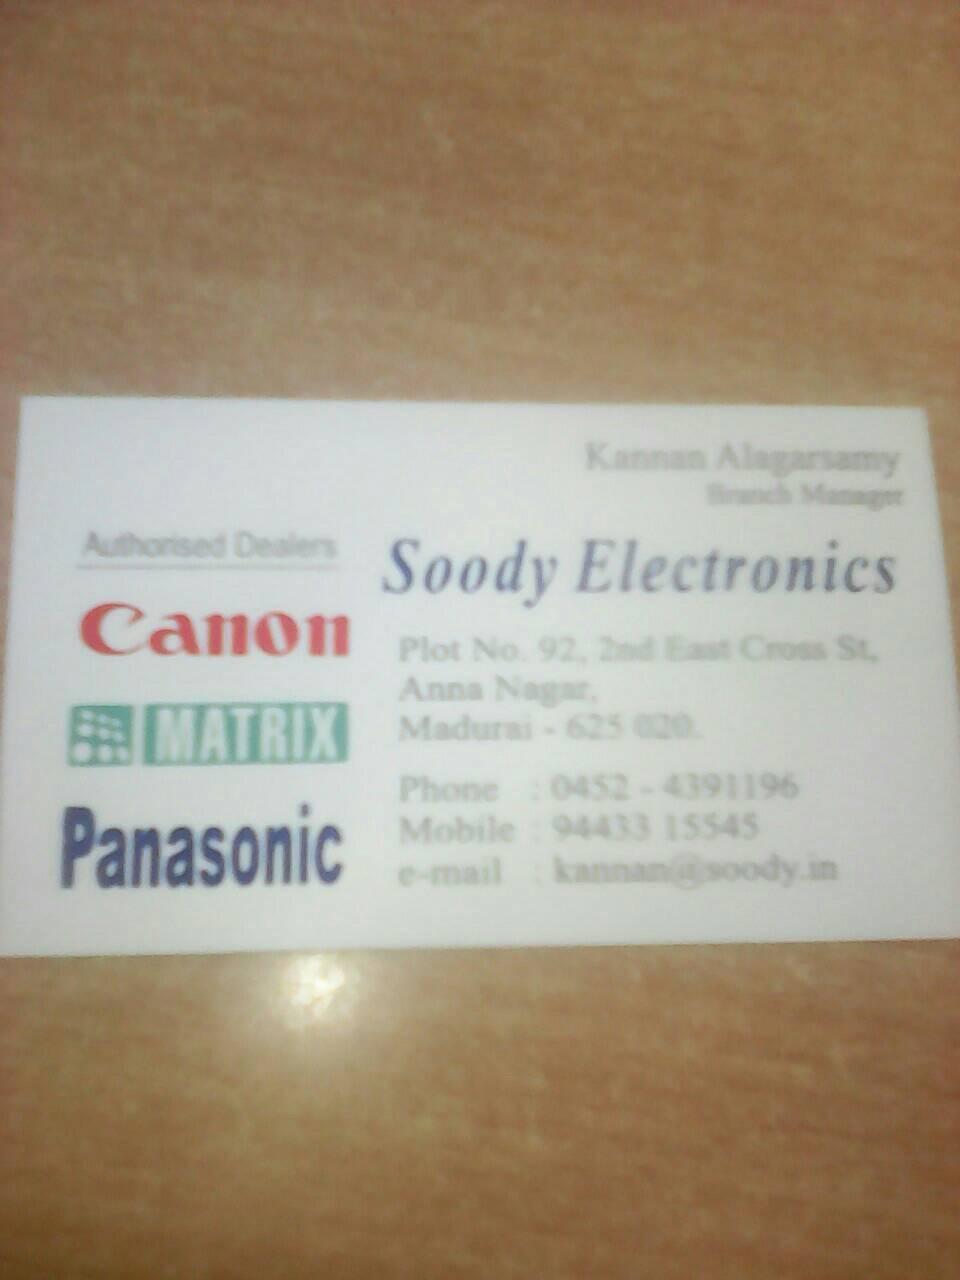 Soody Electronics